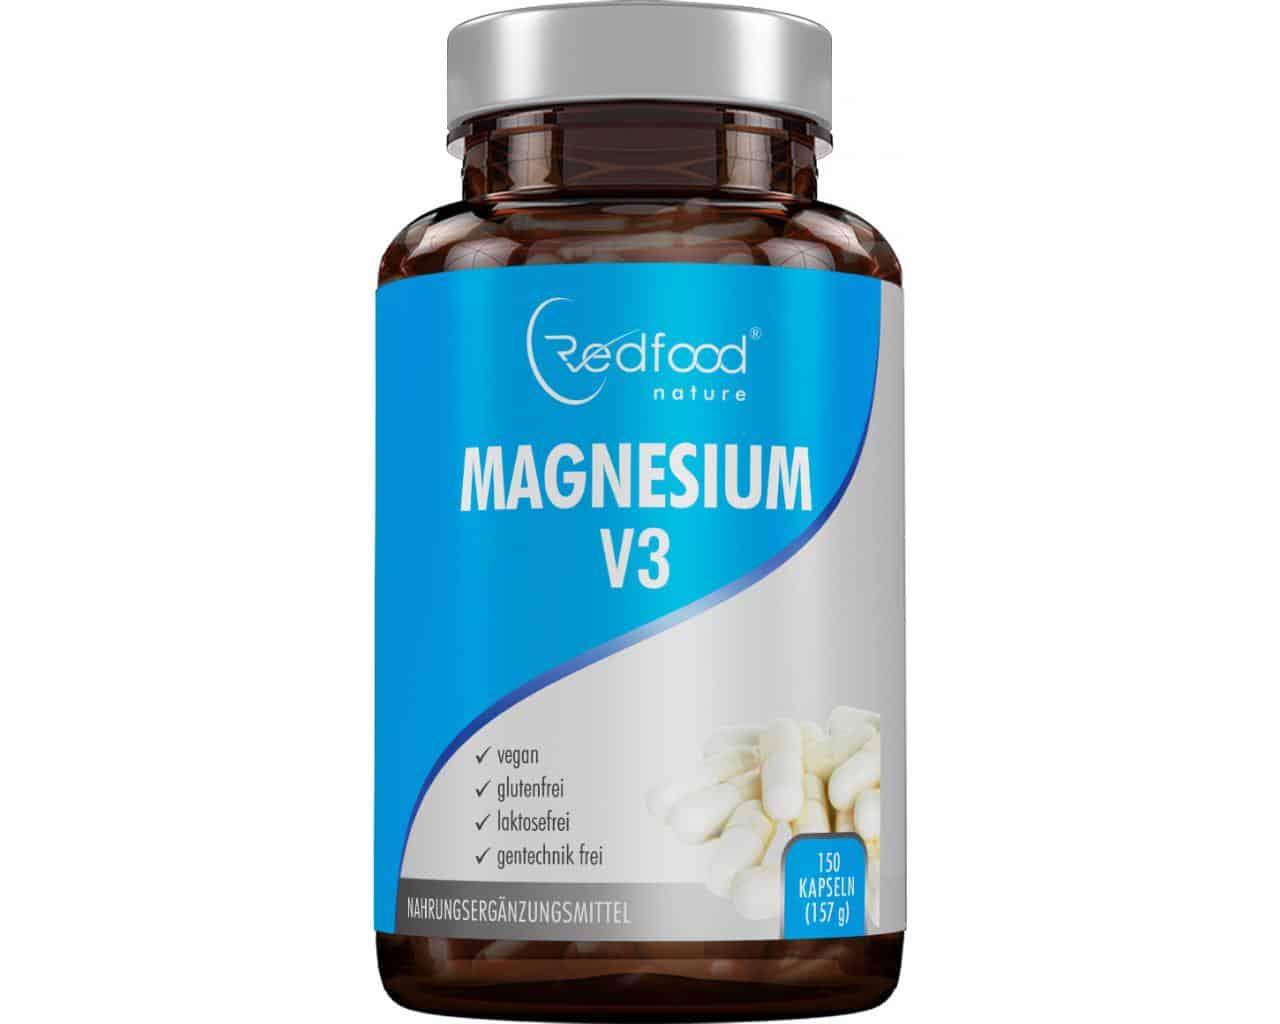 Redfood24 Magnesium V3 00001